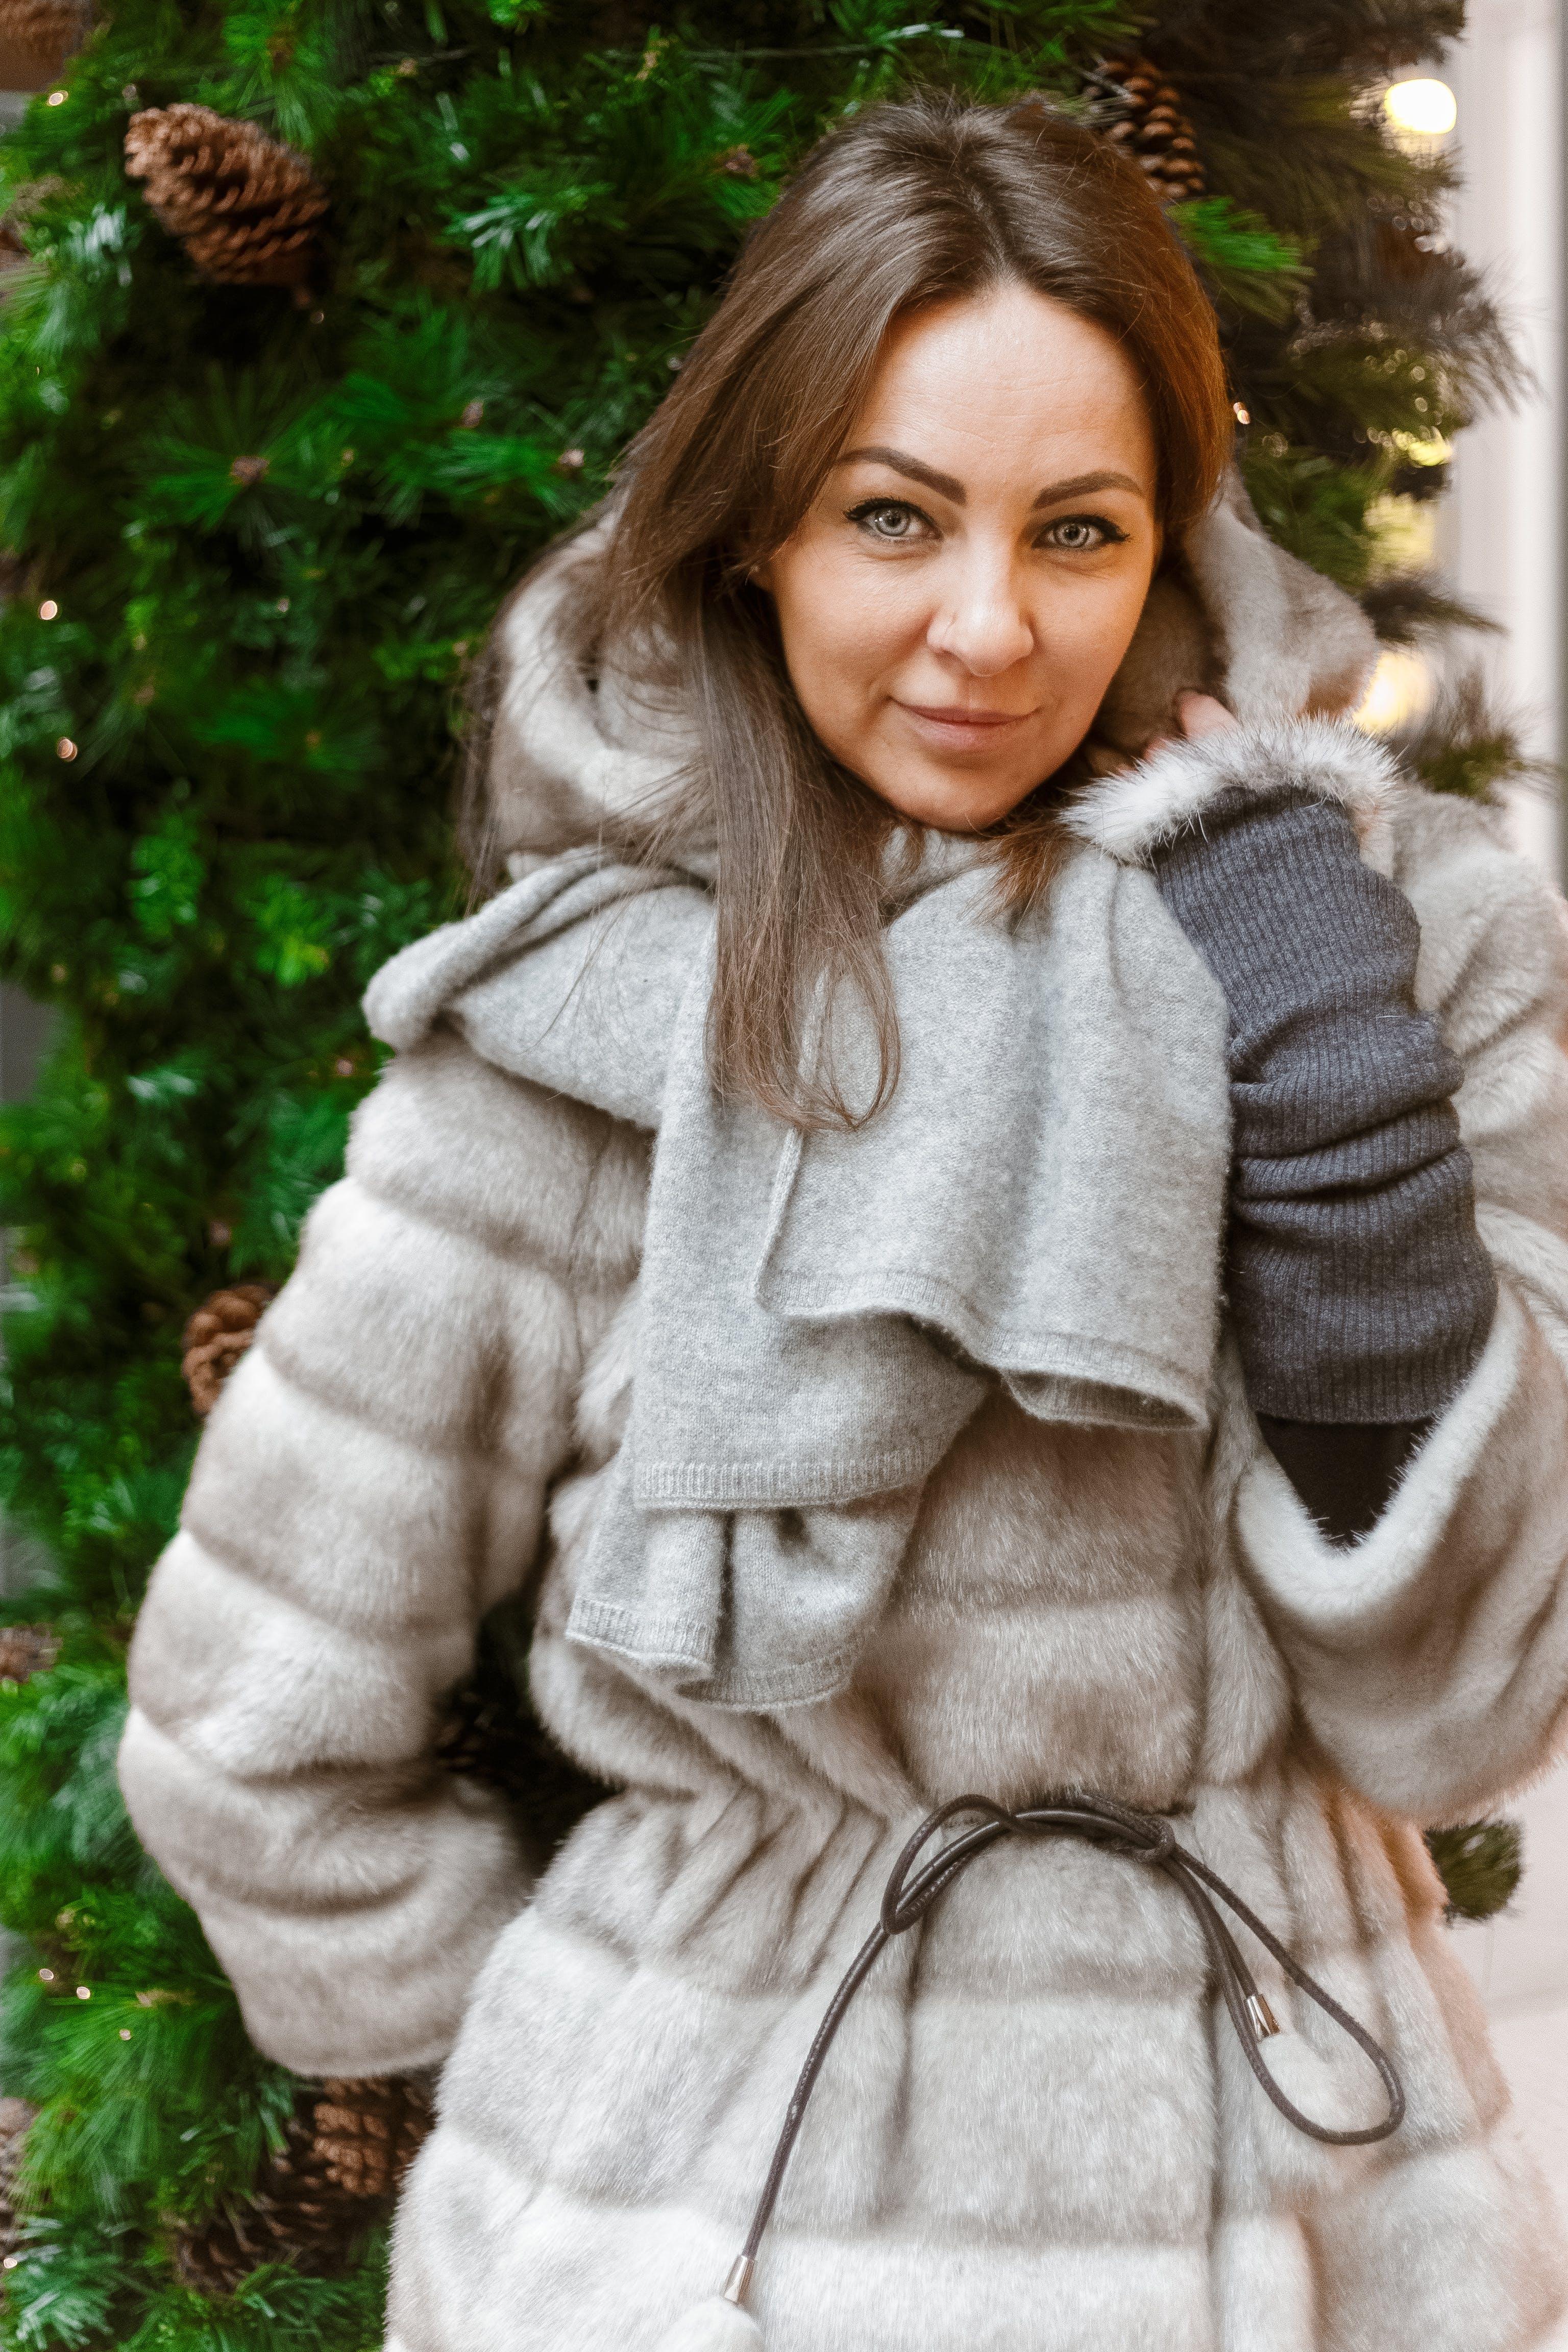 Woman in Winter Coat Standing Near Christmas Tree